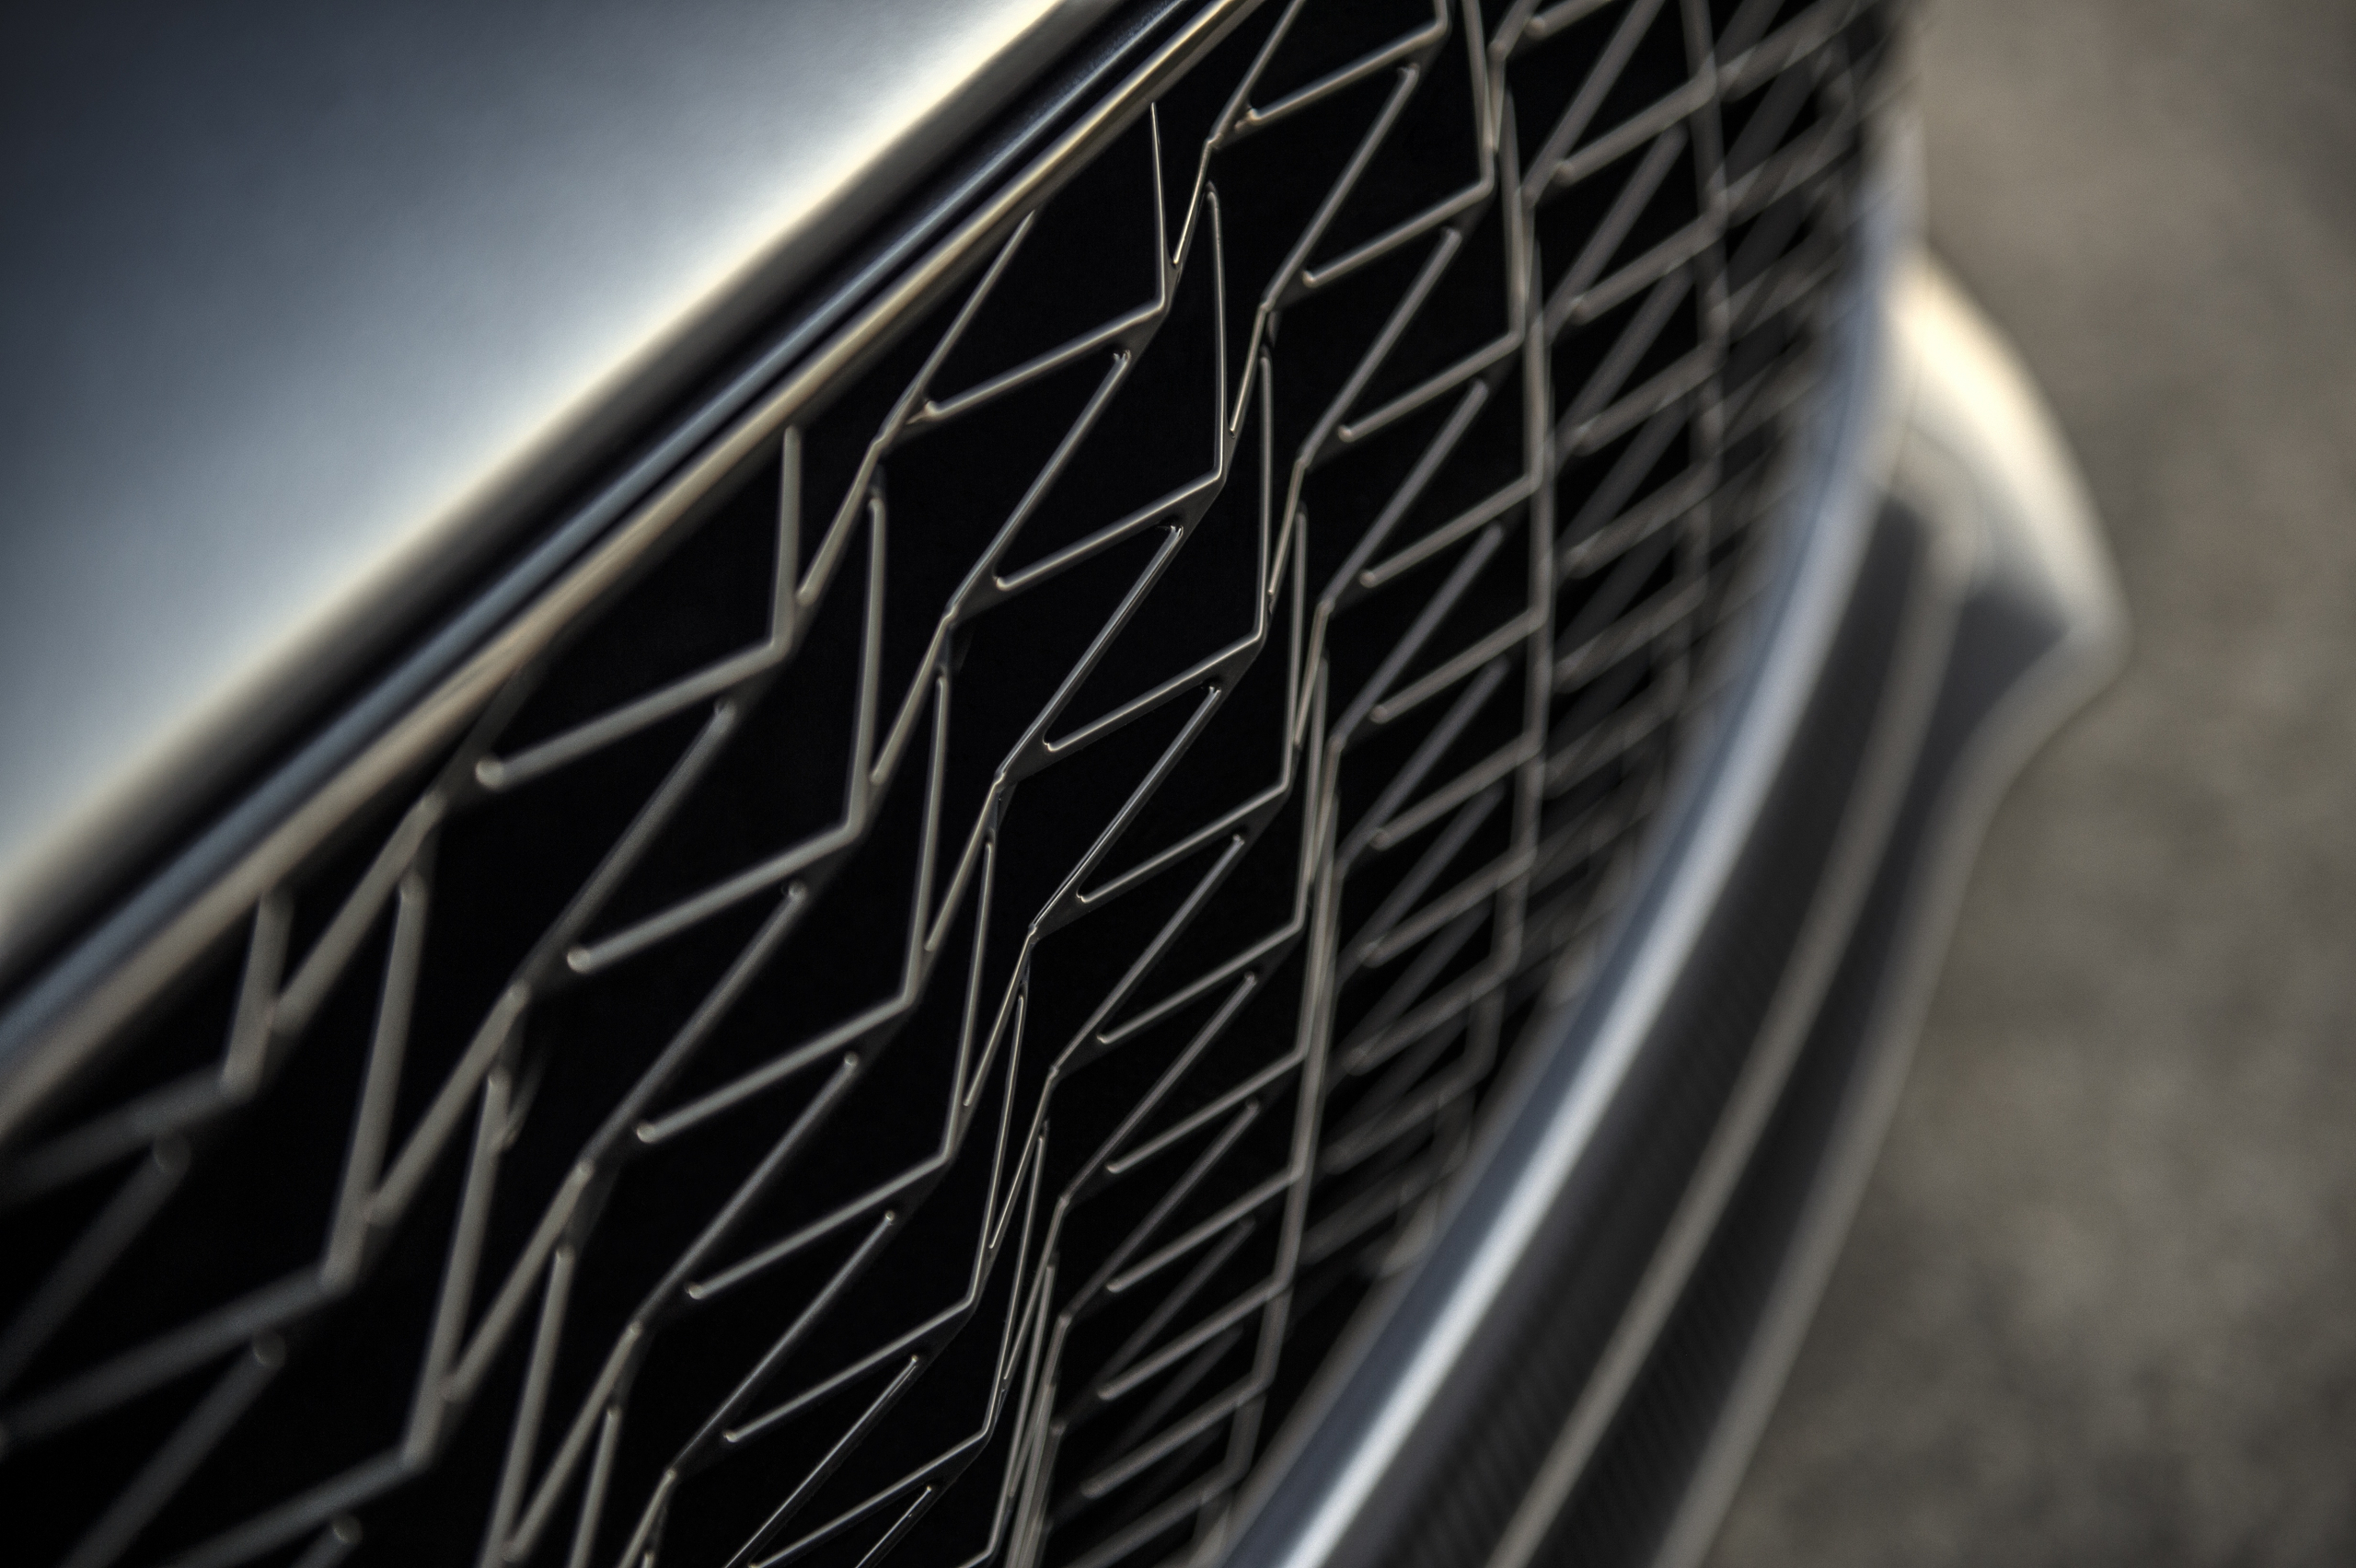 Aston Martin Vanquish Zagato grille